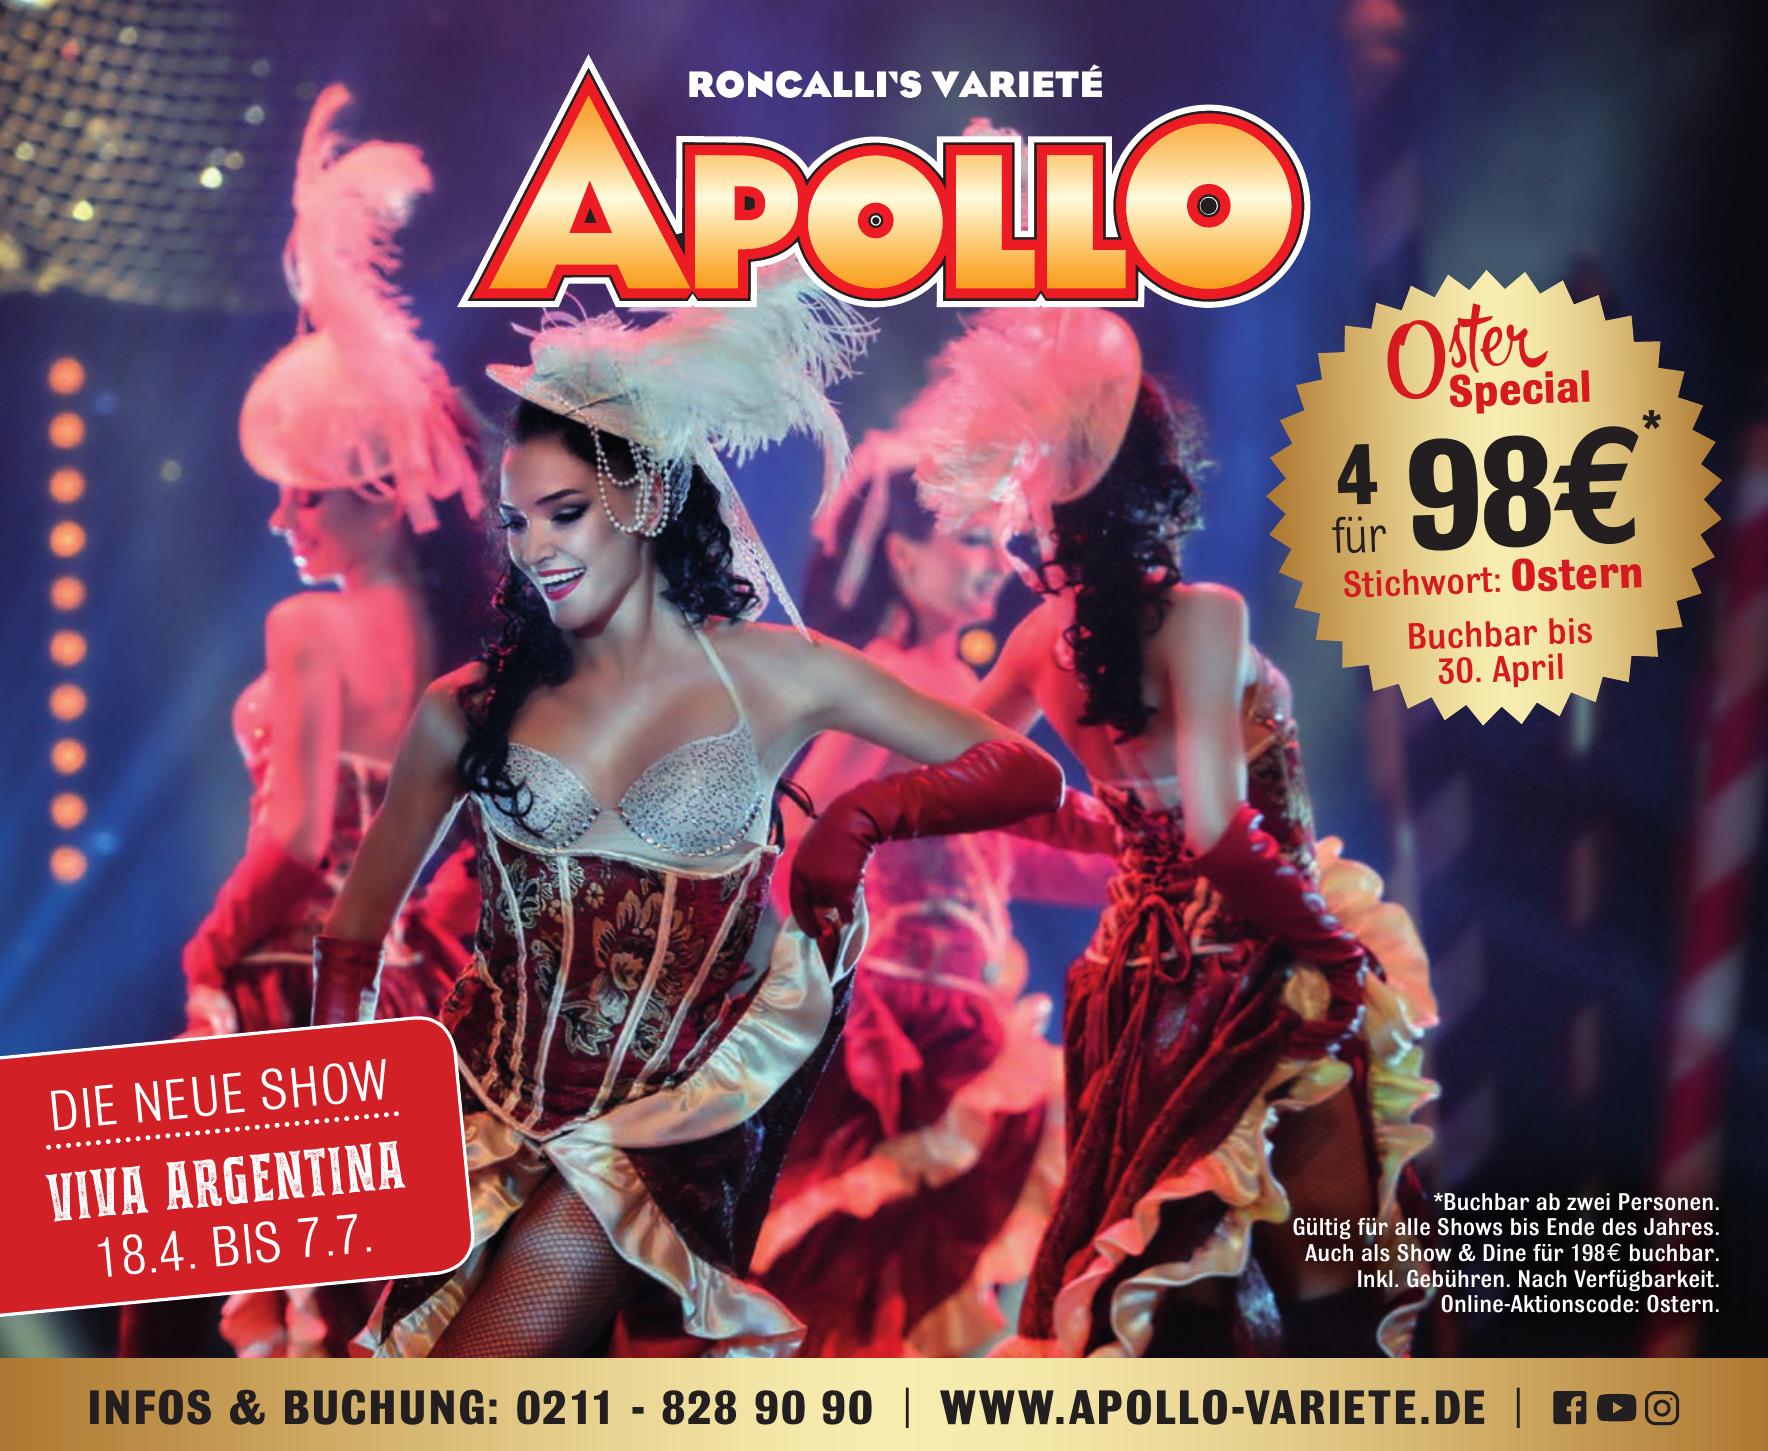 Roncalli´s Varieté Apollo